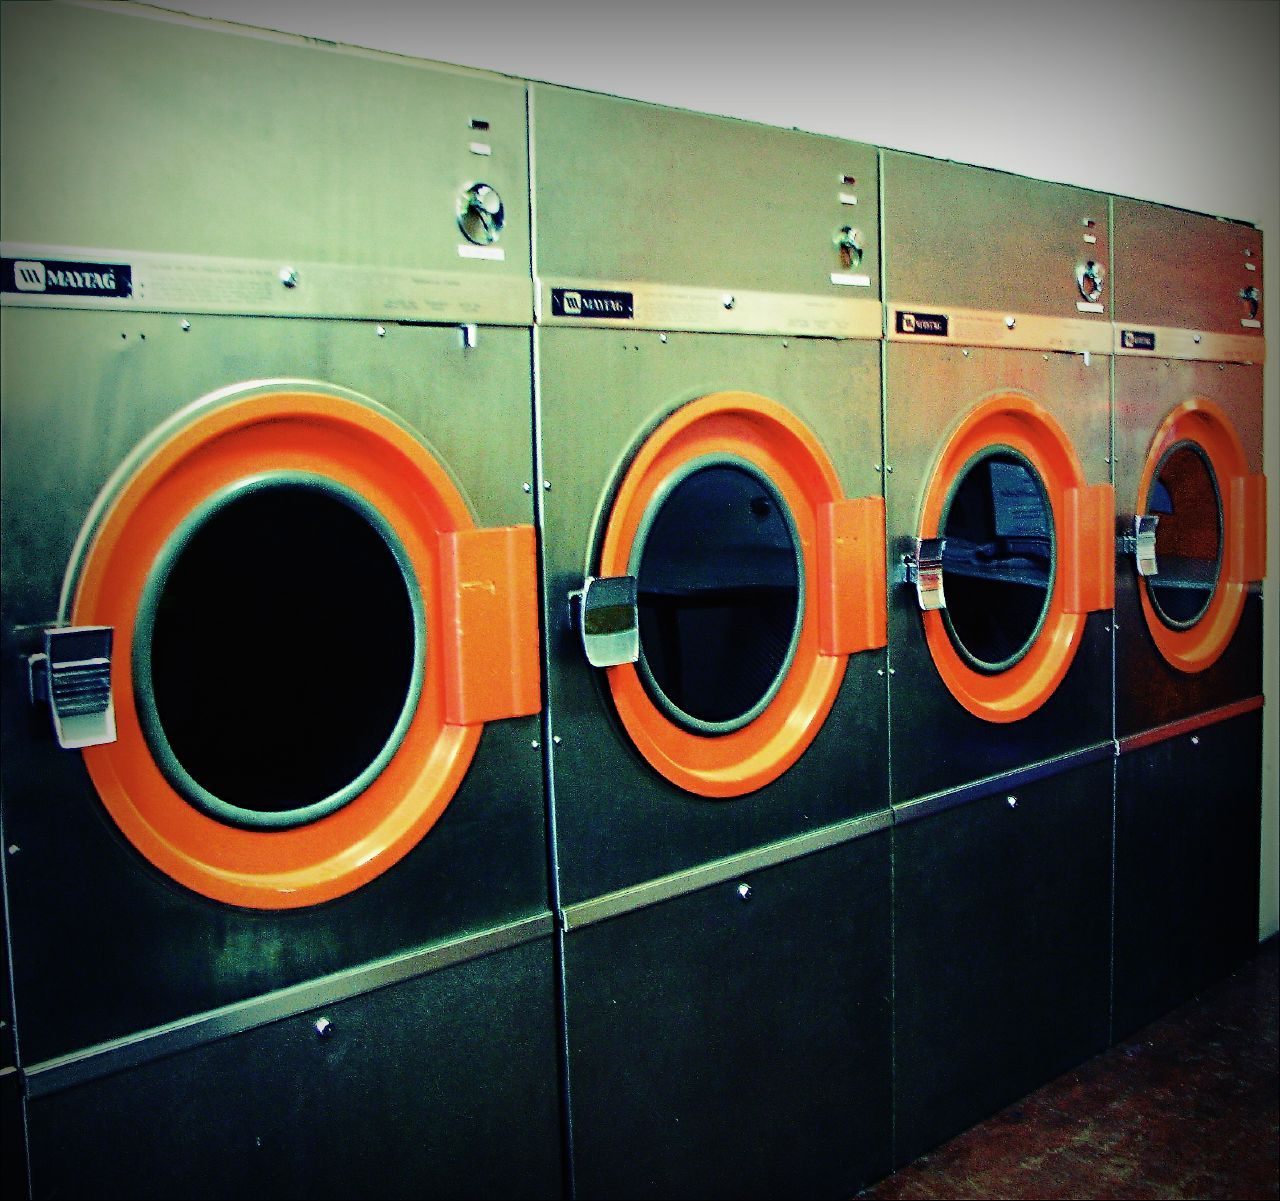 Retro laundromat laundromat pinterest retro laundromat solutioingenieria Choice Image